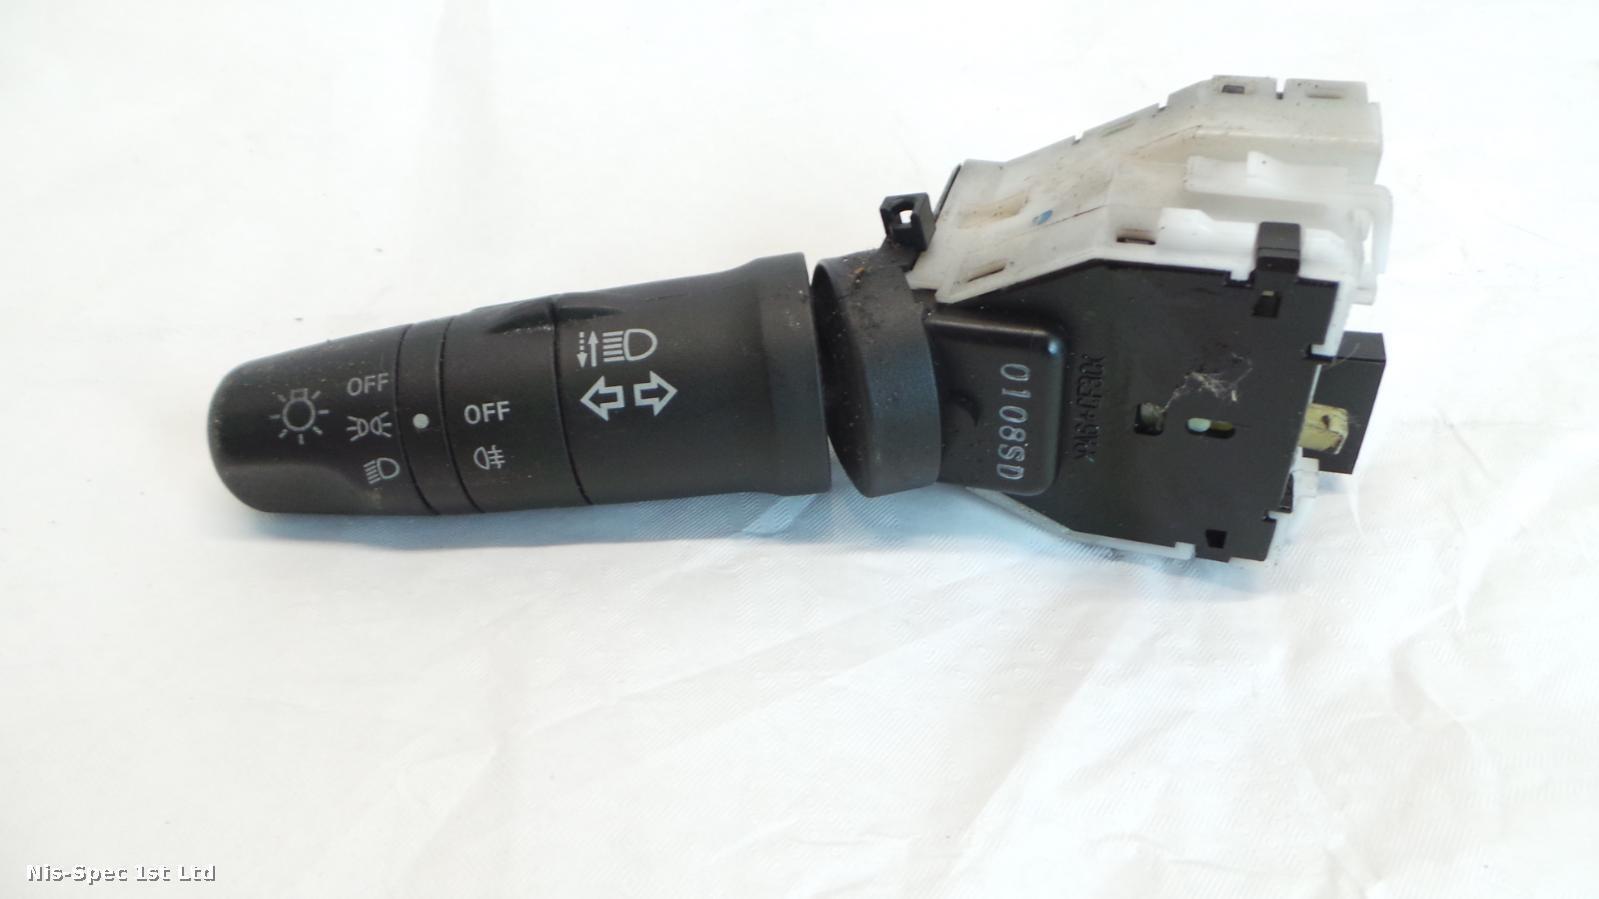 NISSAN NV200 HEADLIGHT AND INDICATOR STALK